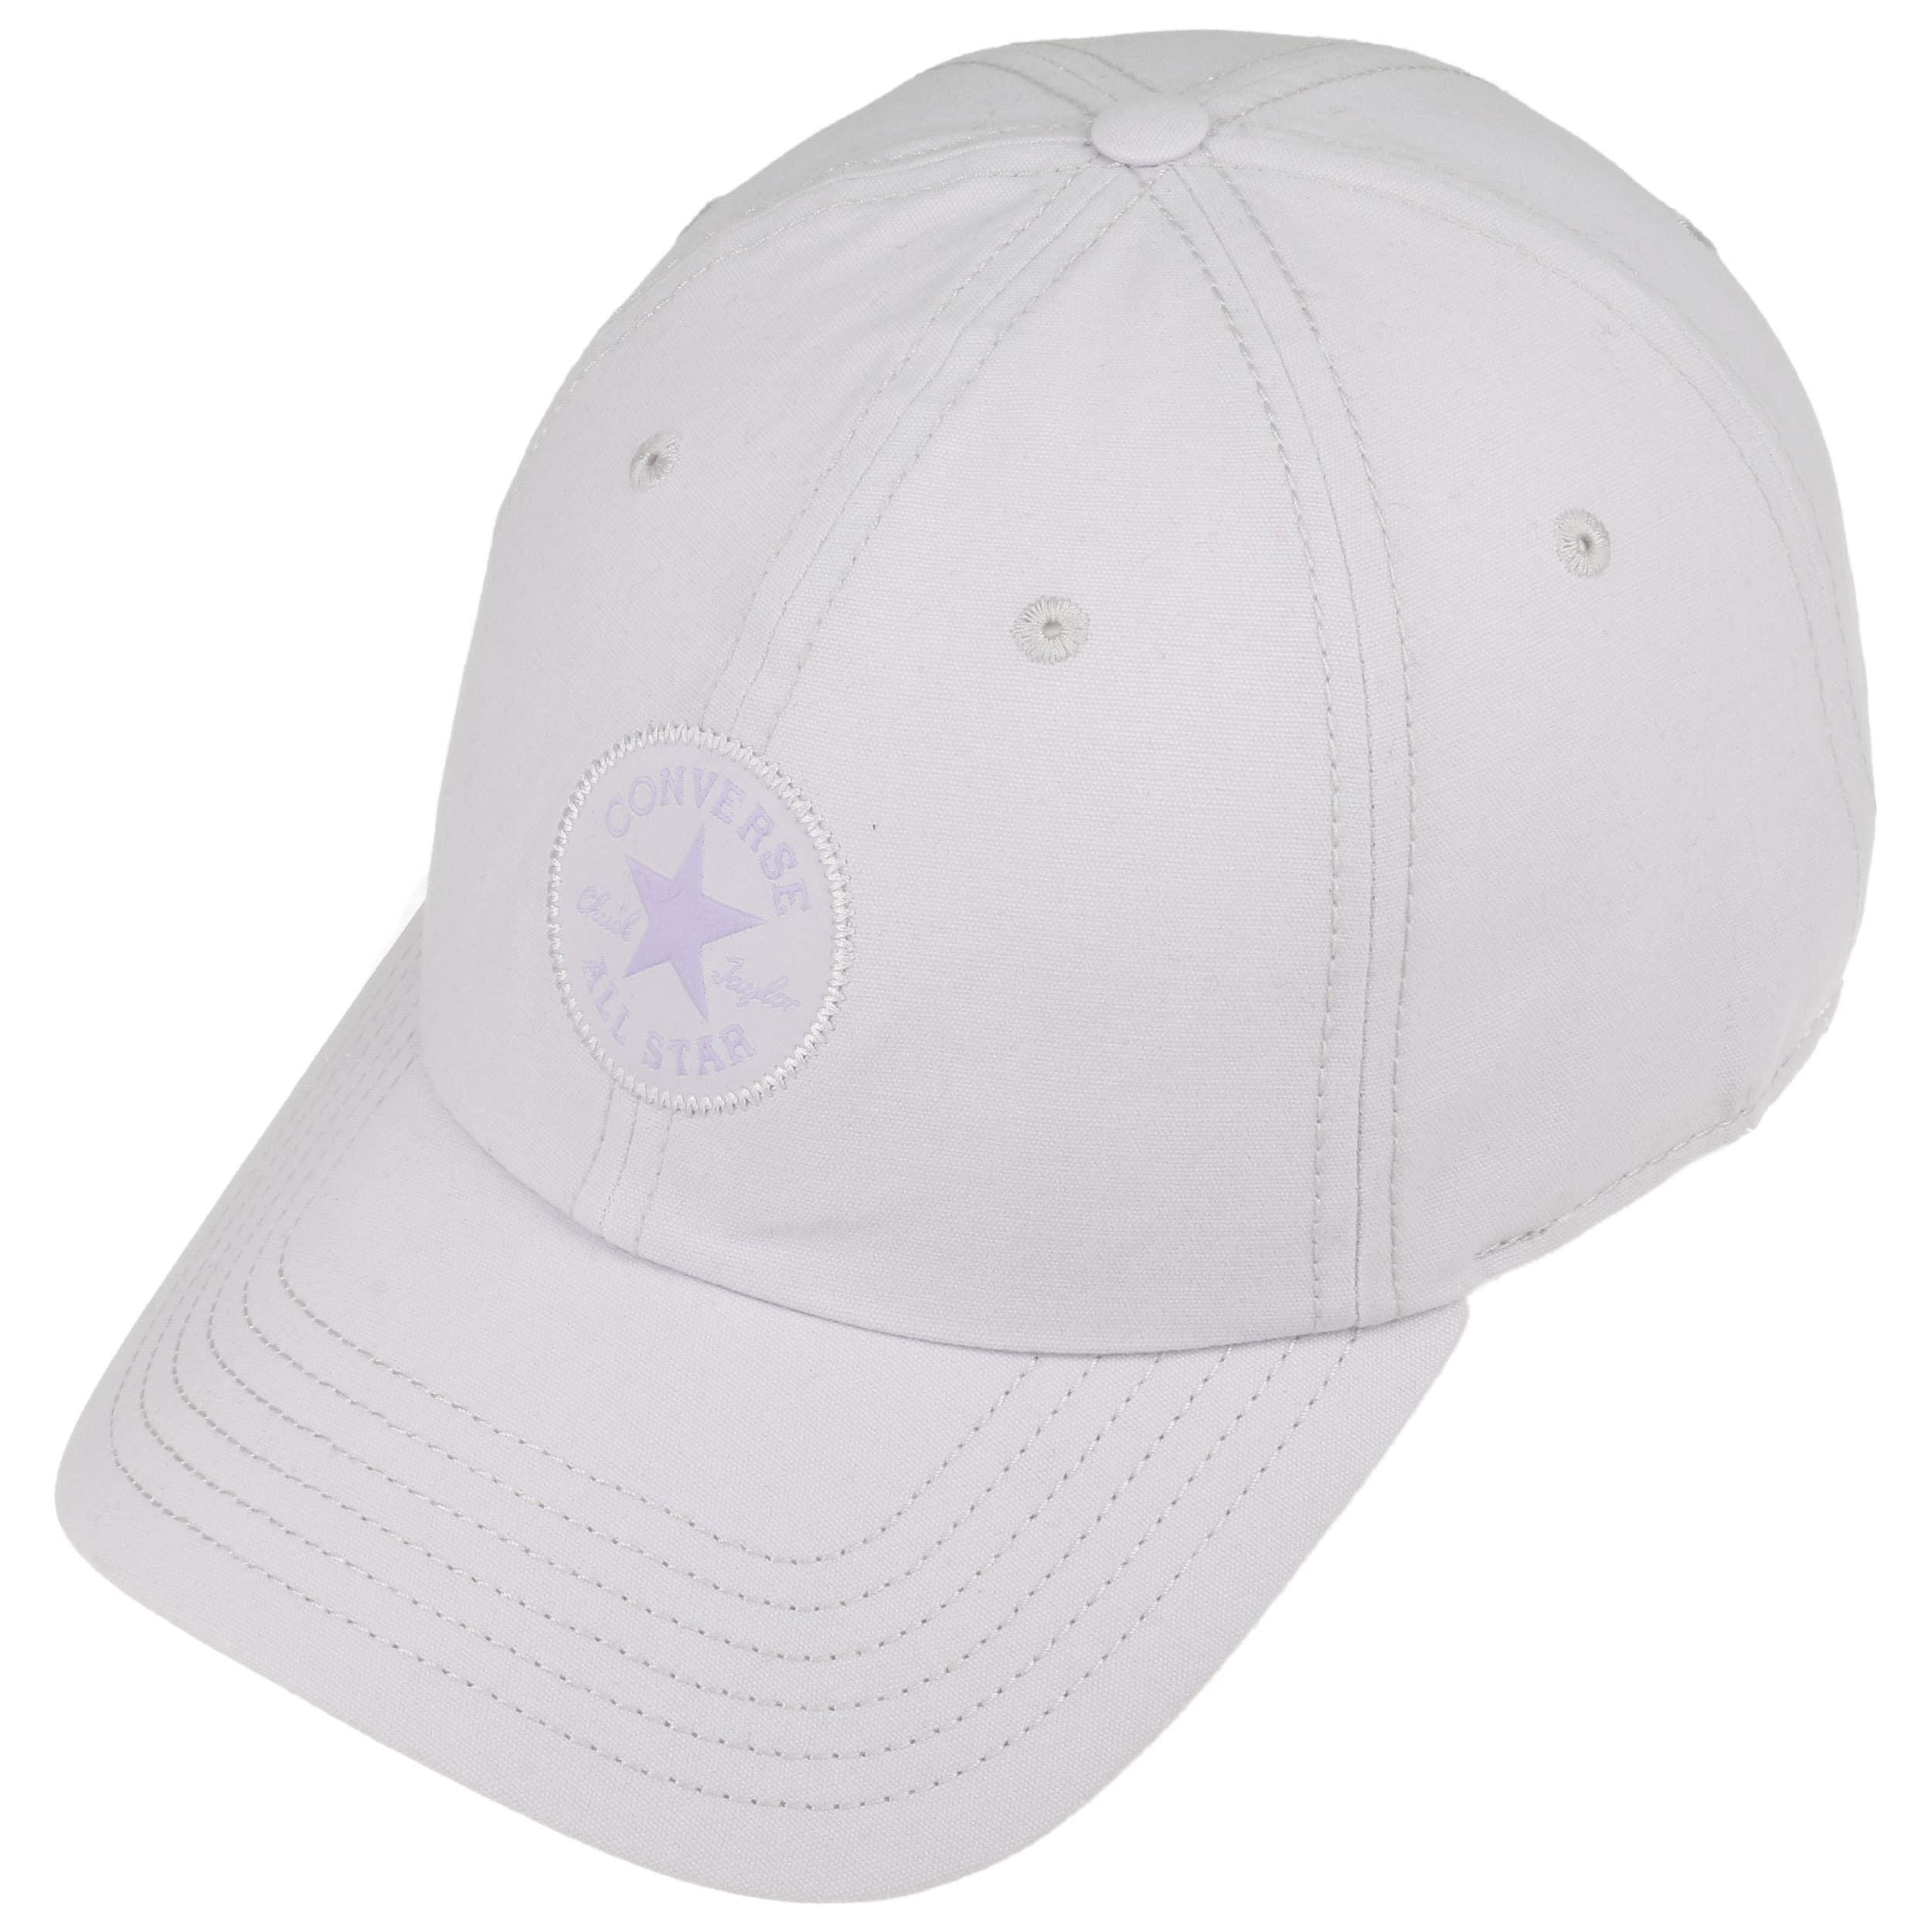 0481491d5270 ... royal-blue 1 · Monotone Strapback Cap by Converse - purple 1 ...